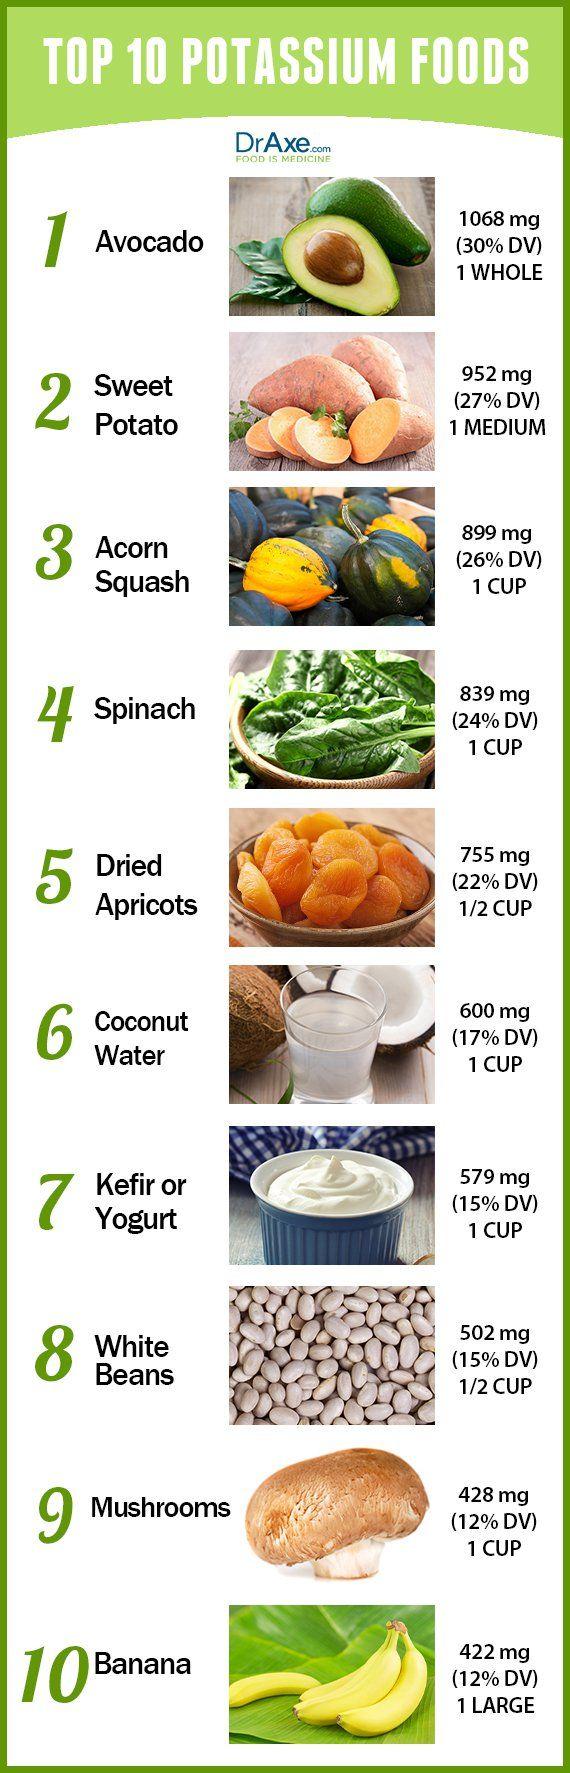 Potassium Foods List, to help prevent preeclampsia